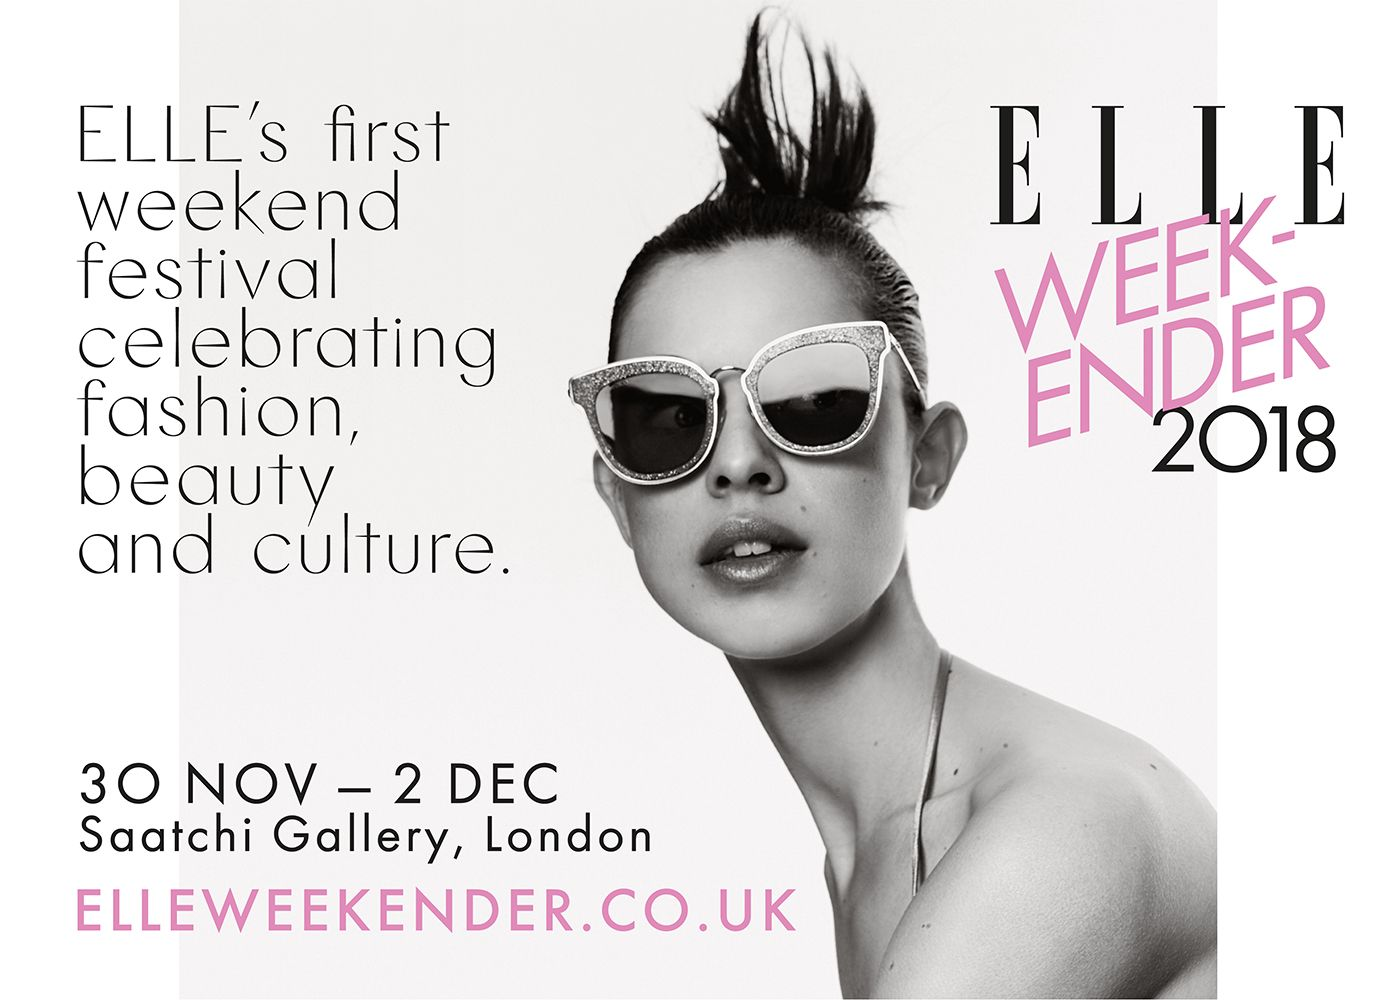 ELLE Weekender, pop up forfahion, beauty, wellness, culture, Saatchi Gallery,London